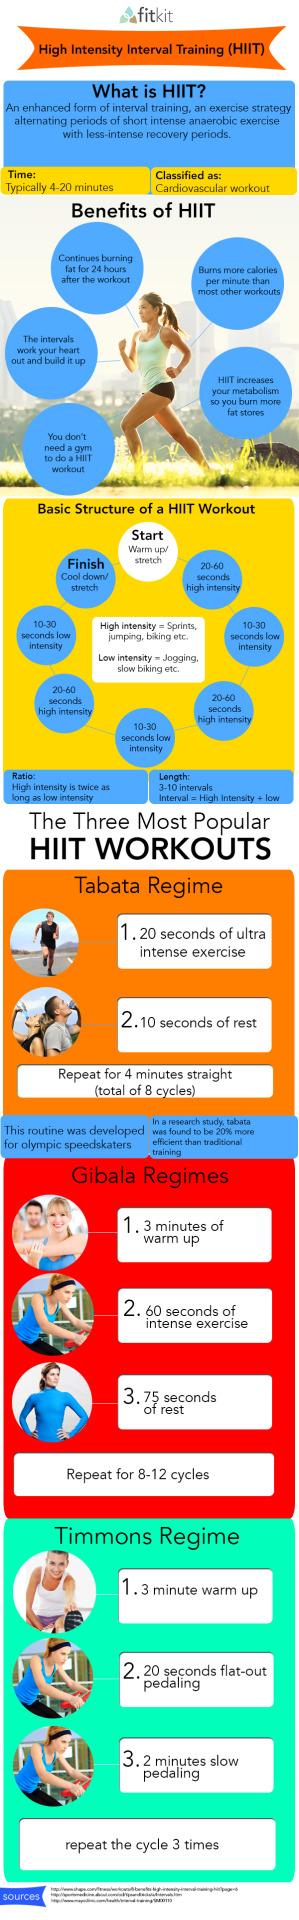 My Healthy Weighs — lashawnaxysantiago Get real Sit Ups